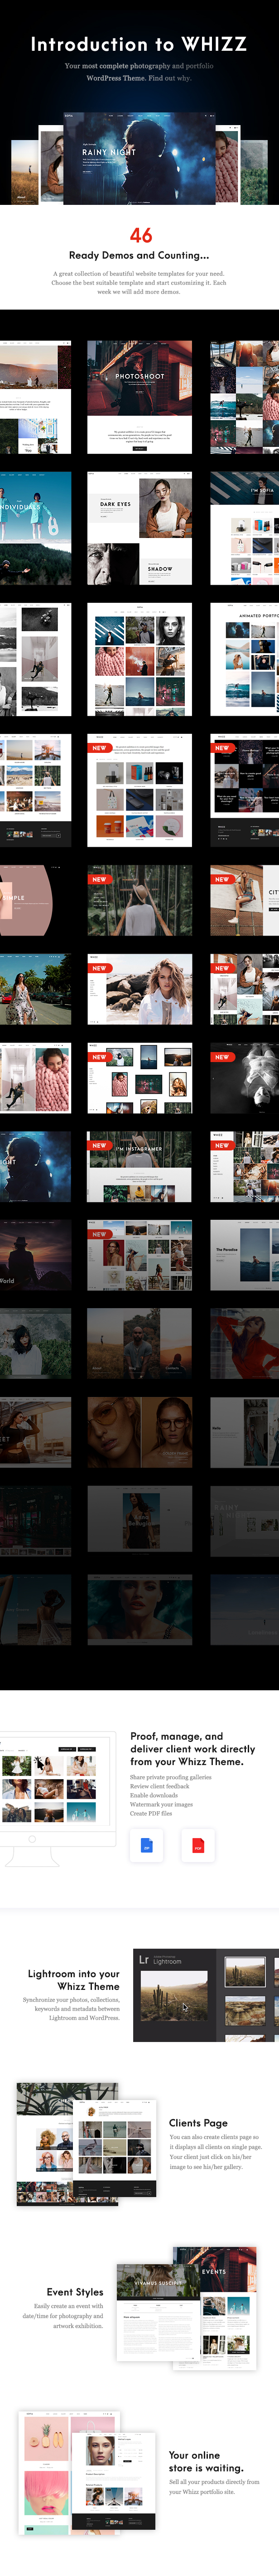 drPbIuiV - Whizz Photography WordPress